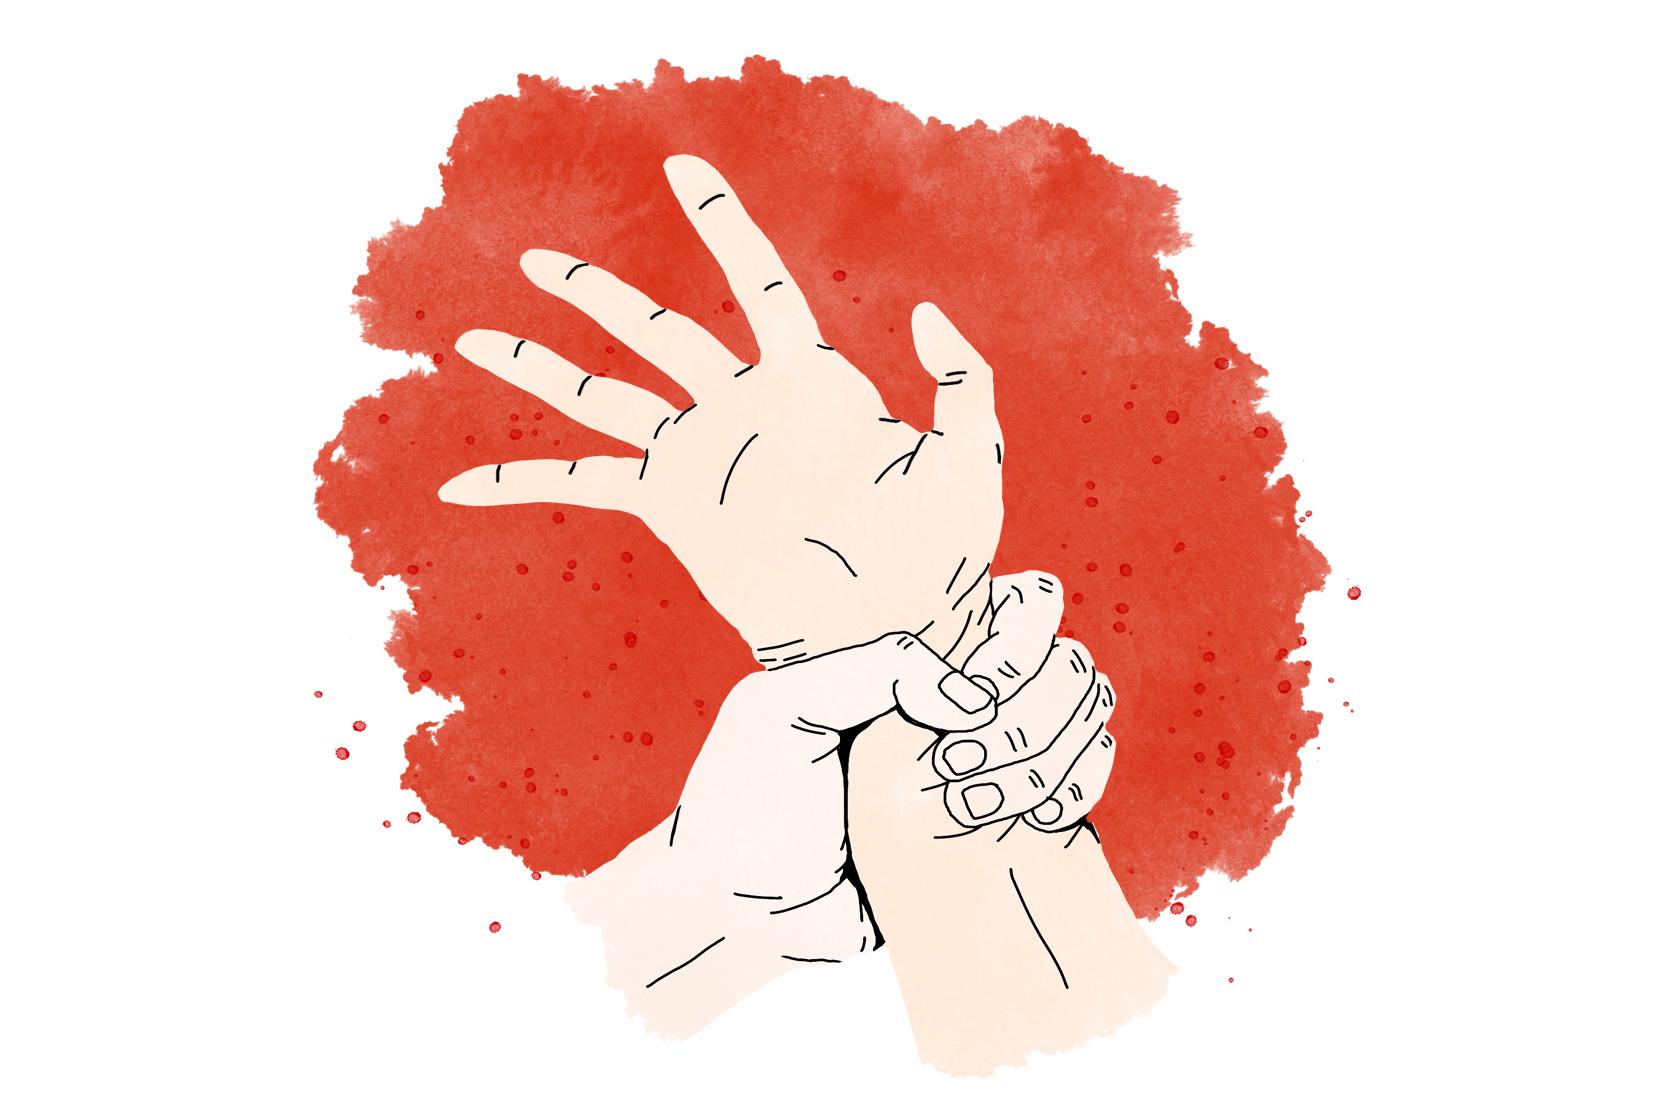 En hand som håller hårt om en annans handled.